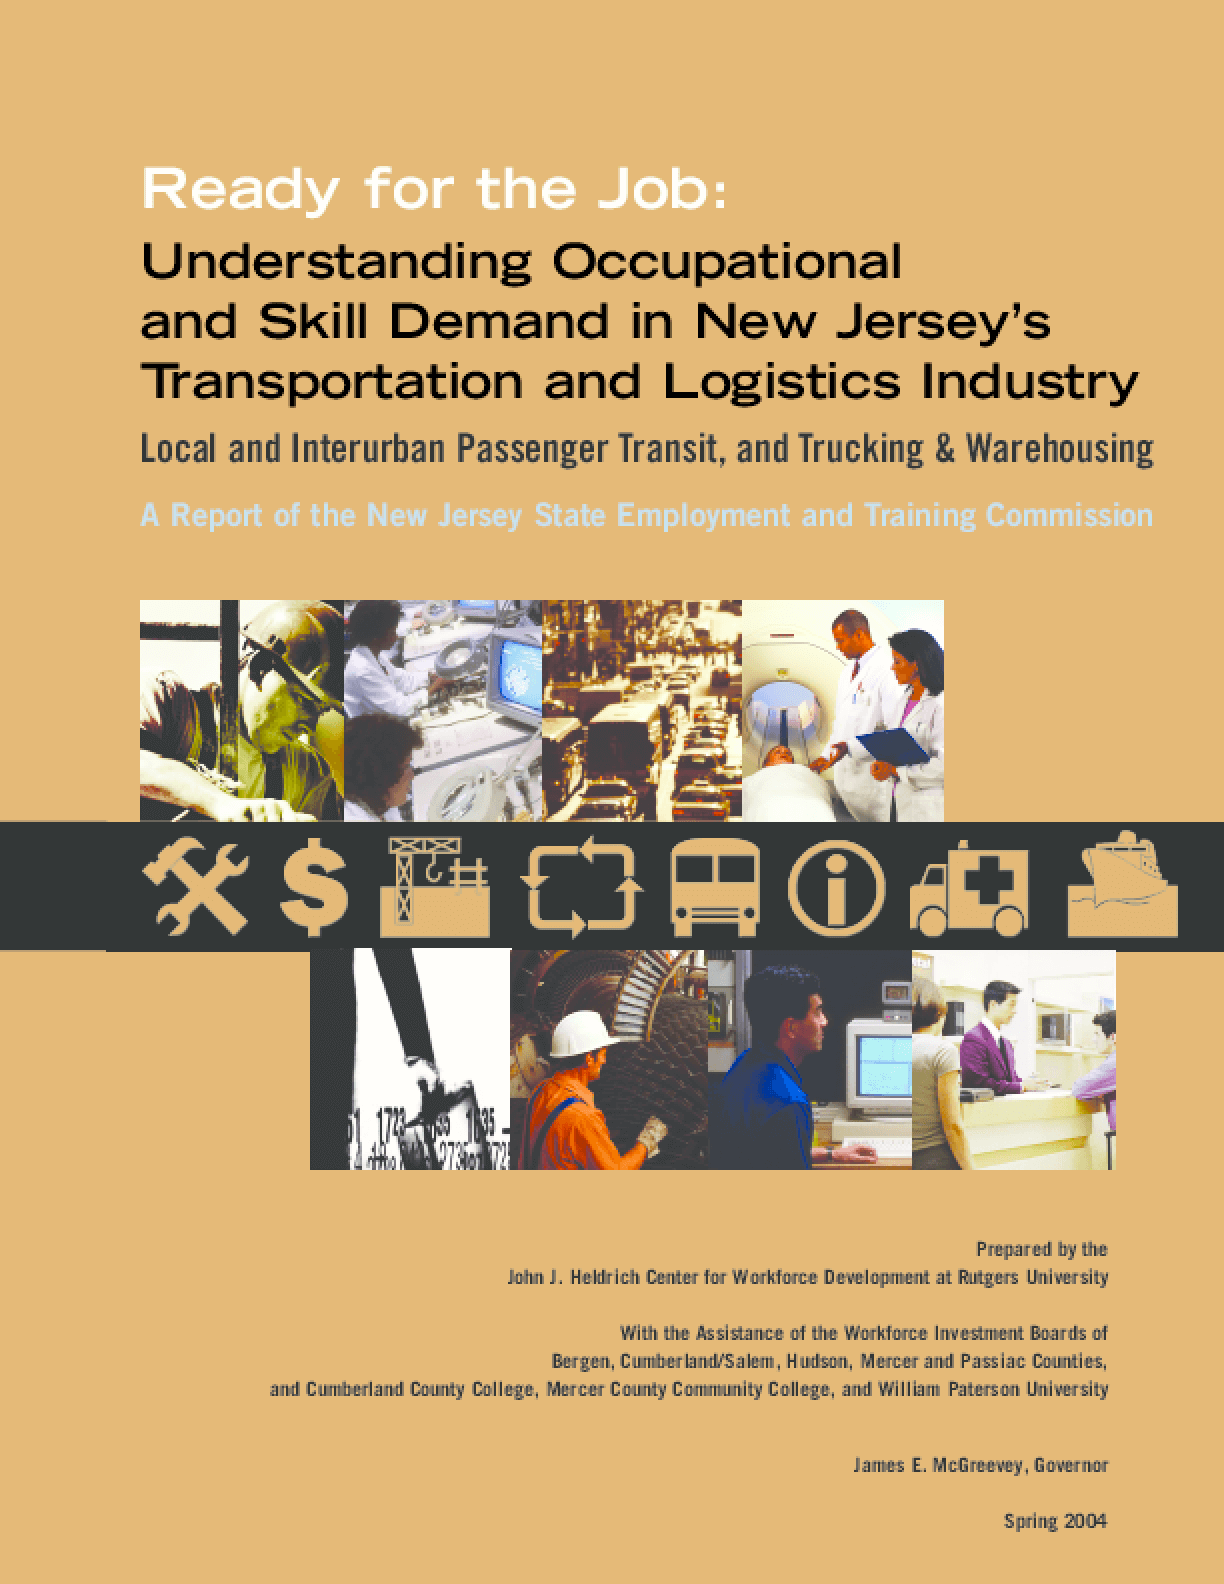 Understanding Occupational/Skill Demand in NJ's Transportation/Logistics Industry